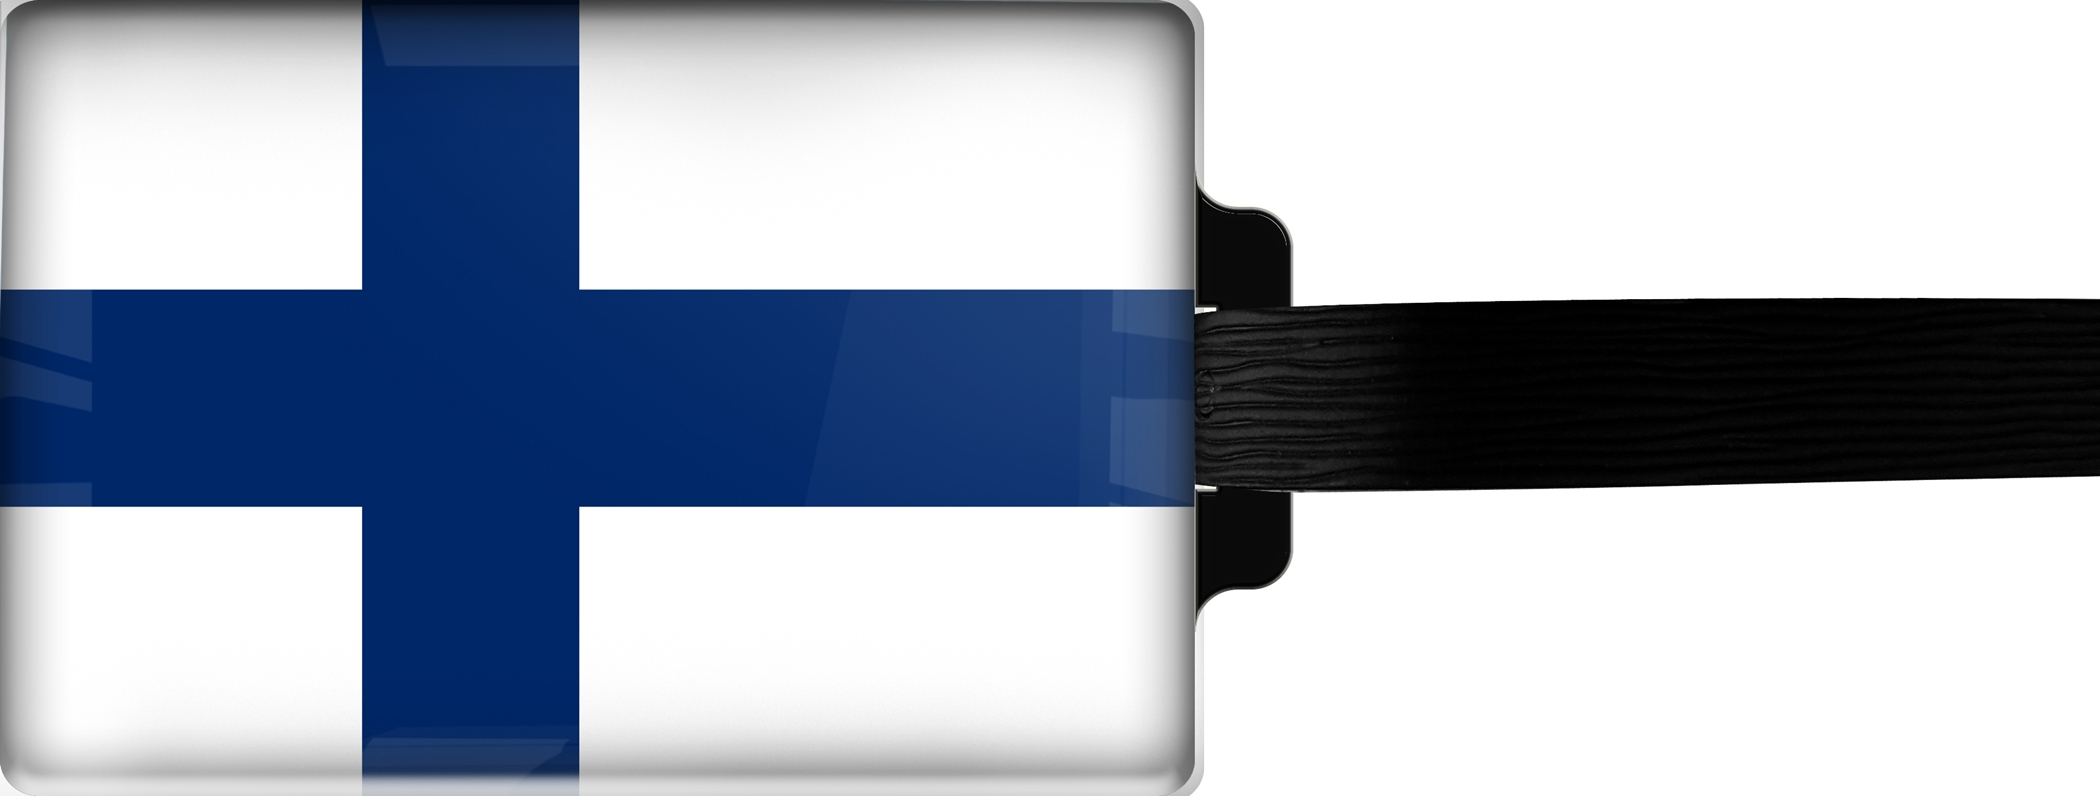 Hochwertiger Gepäckanhänger aus Acrylglas | FLAGGE FINNLAND | metALUm #00090